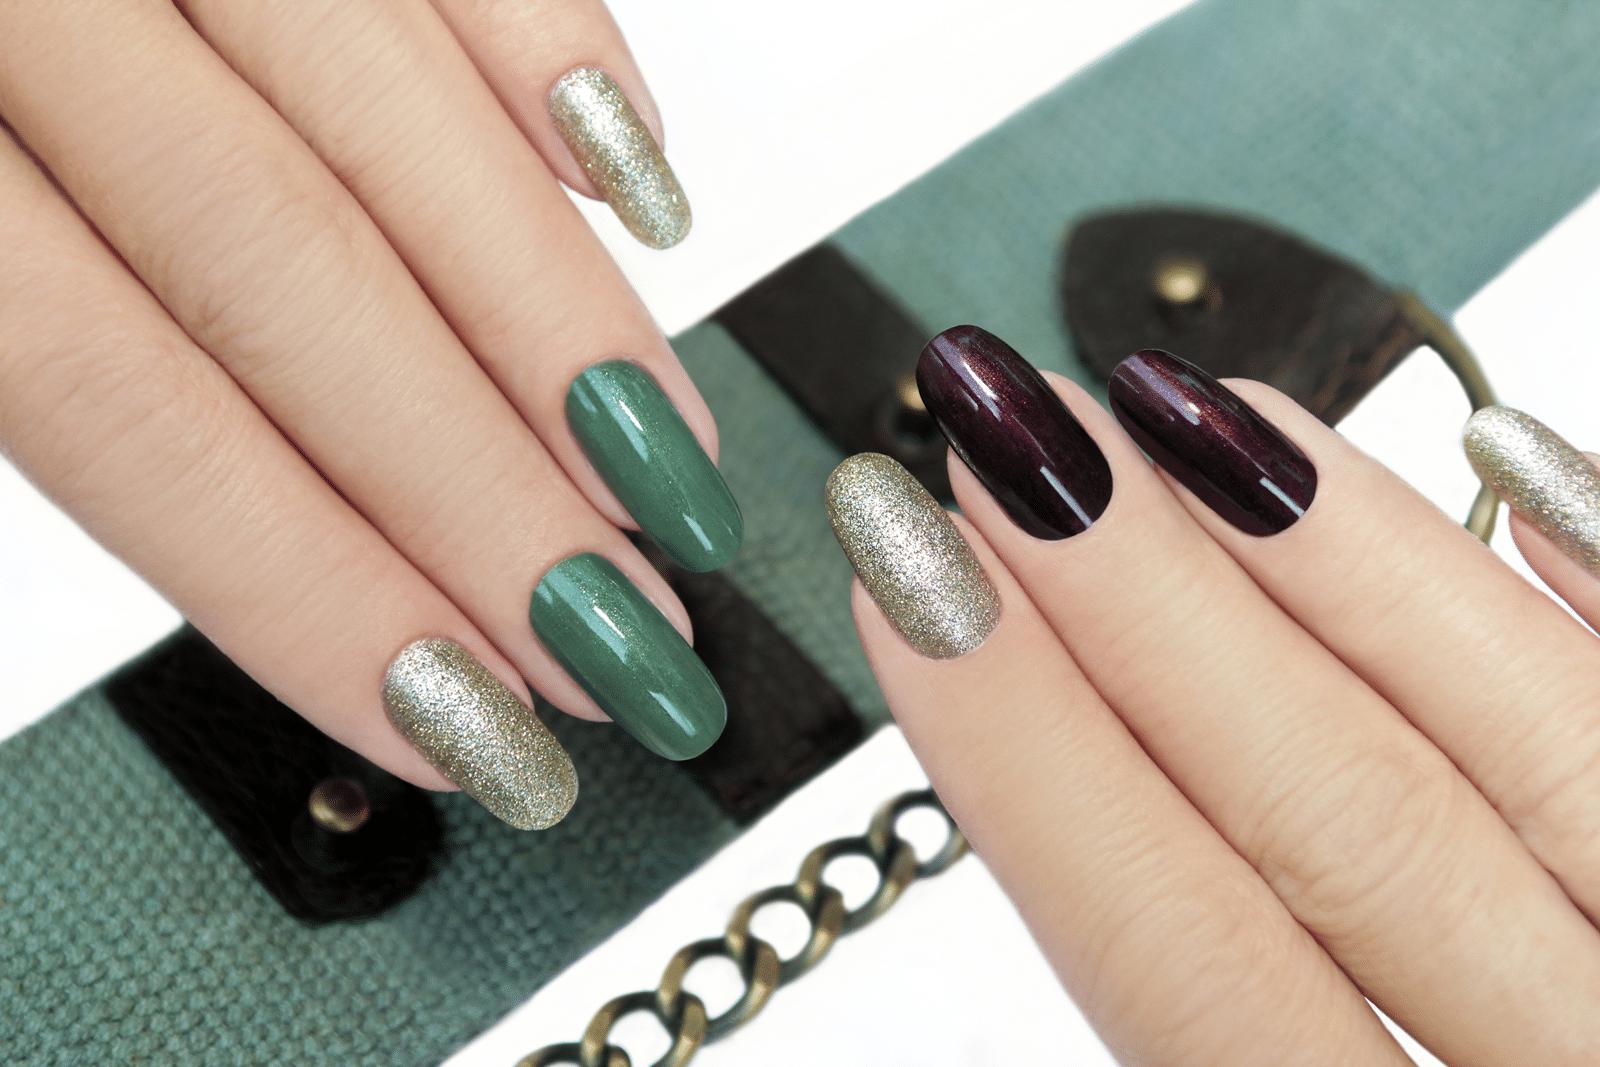 Nail - Beautiful Nails #2793666 - Weddbook